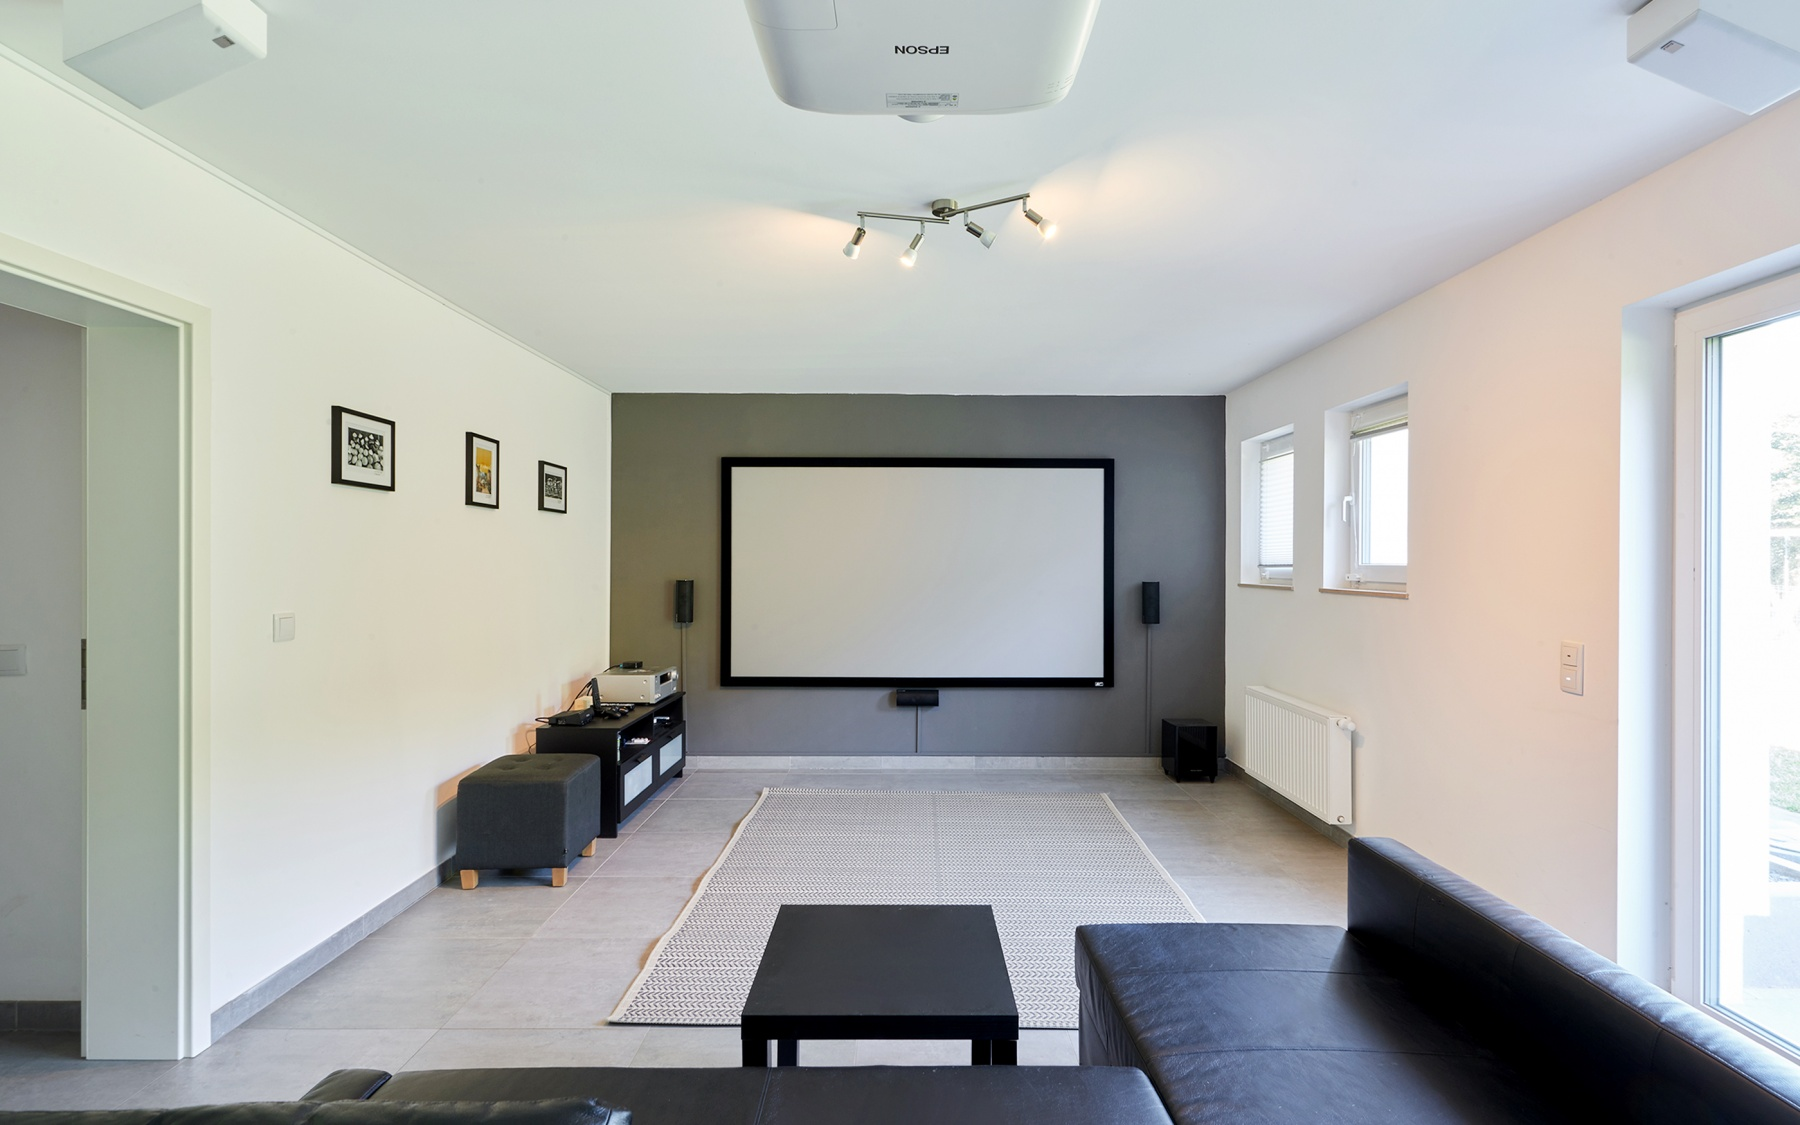 Maison moderne à Bourglinster